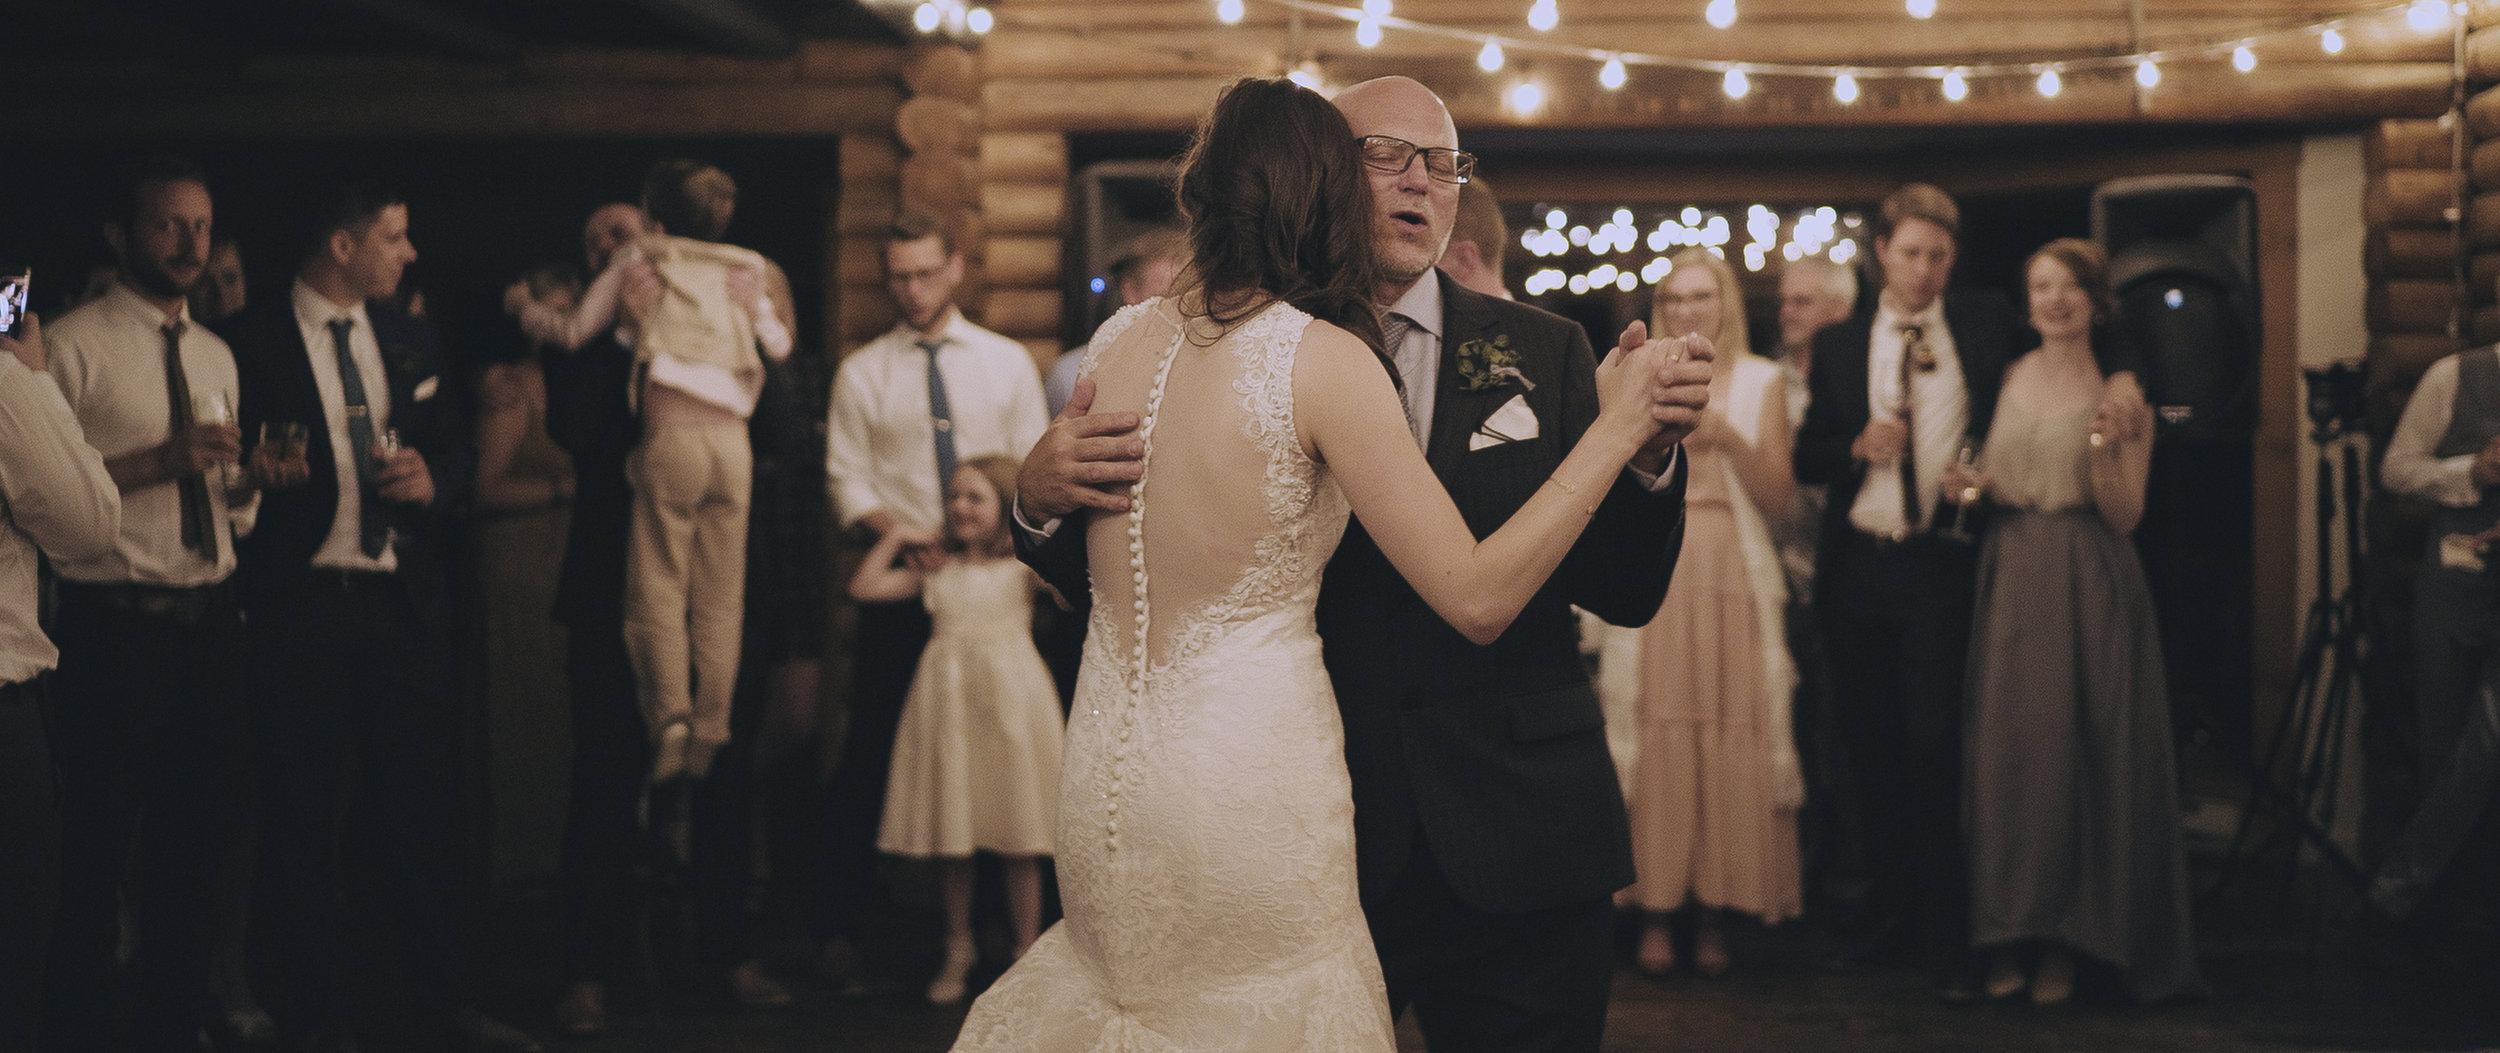 BC Wedding Videography-2.jpg